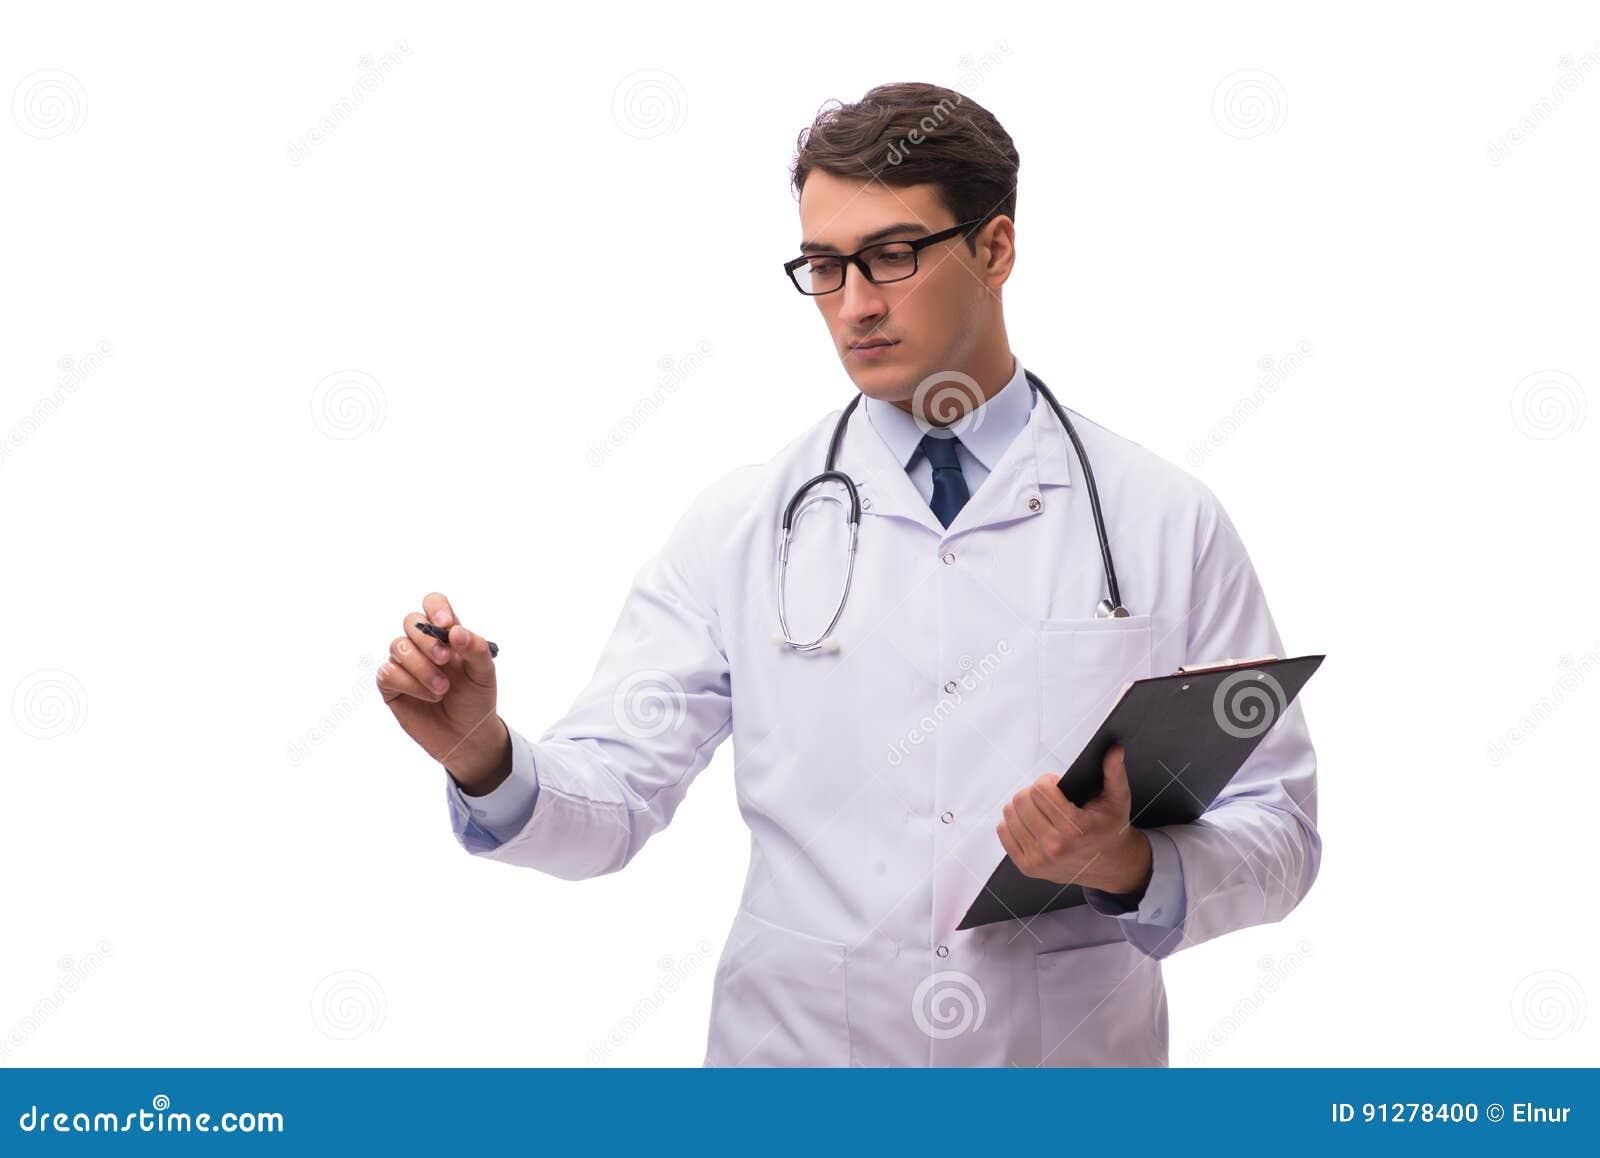 Den unga doktorn som isoleras på vit bakgrund